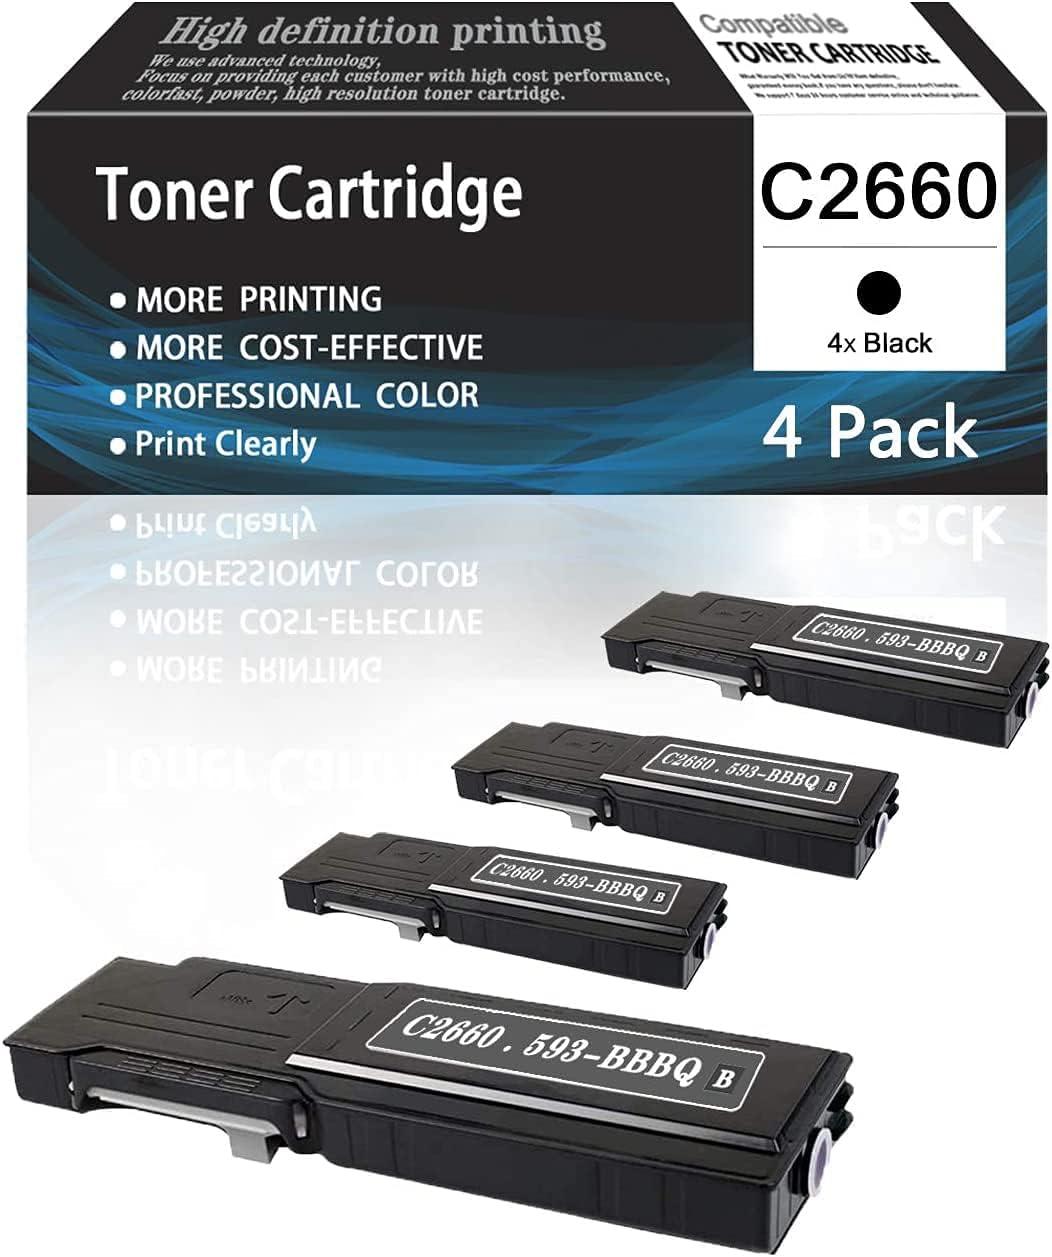 4 Pack C2660 593-BBBQ Black TonerCartridgeCompatibleforDell Printer C2660 C2660dn C2665dnf Printers Toner Cartridge,Sold by AcToner.